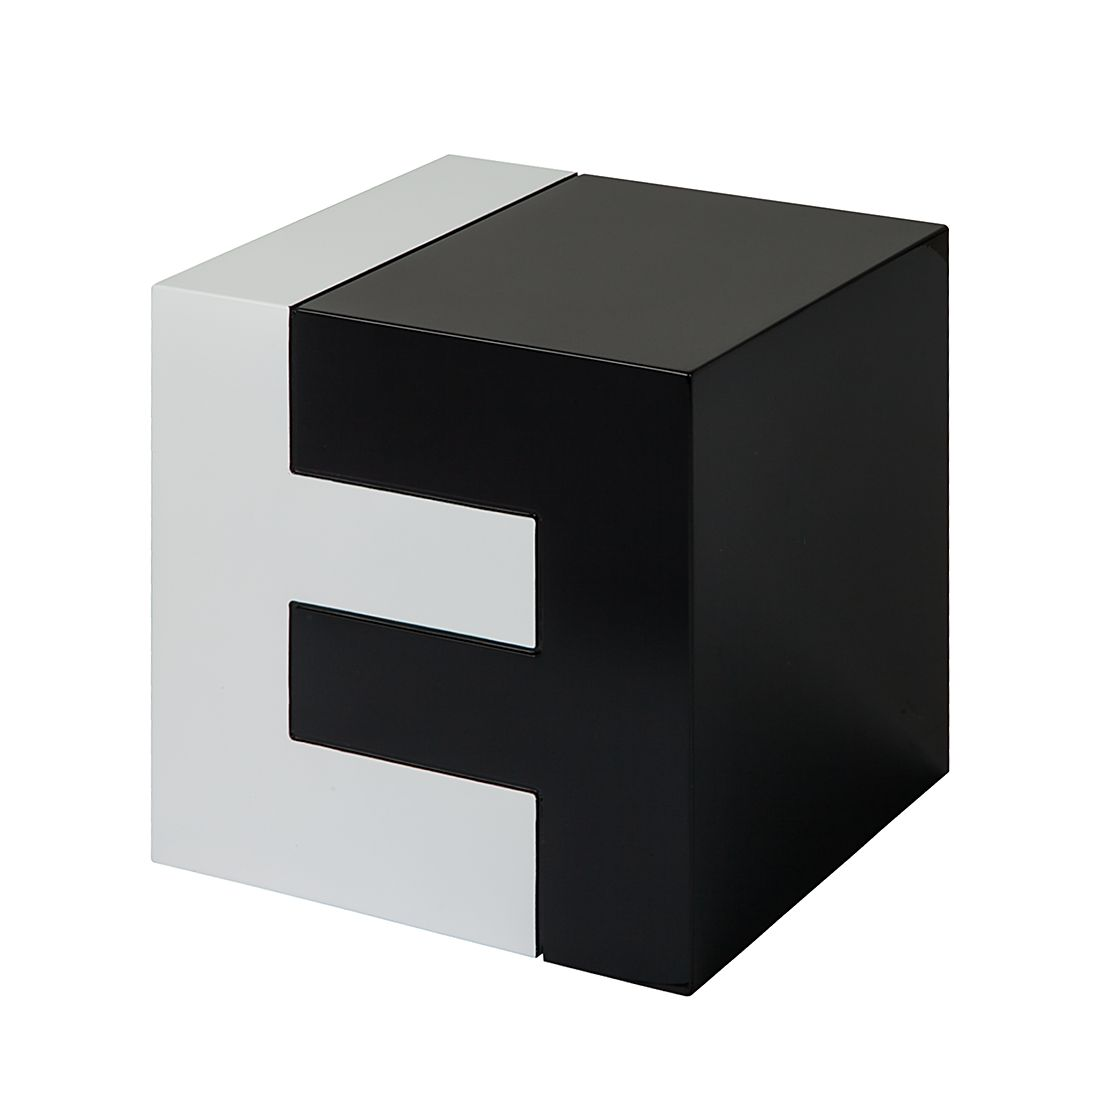 Tavolino Barcelona - Bianco/Nero Lucido, Fredriks